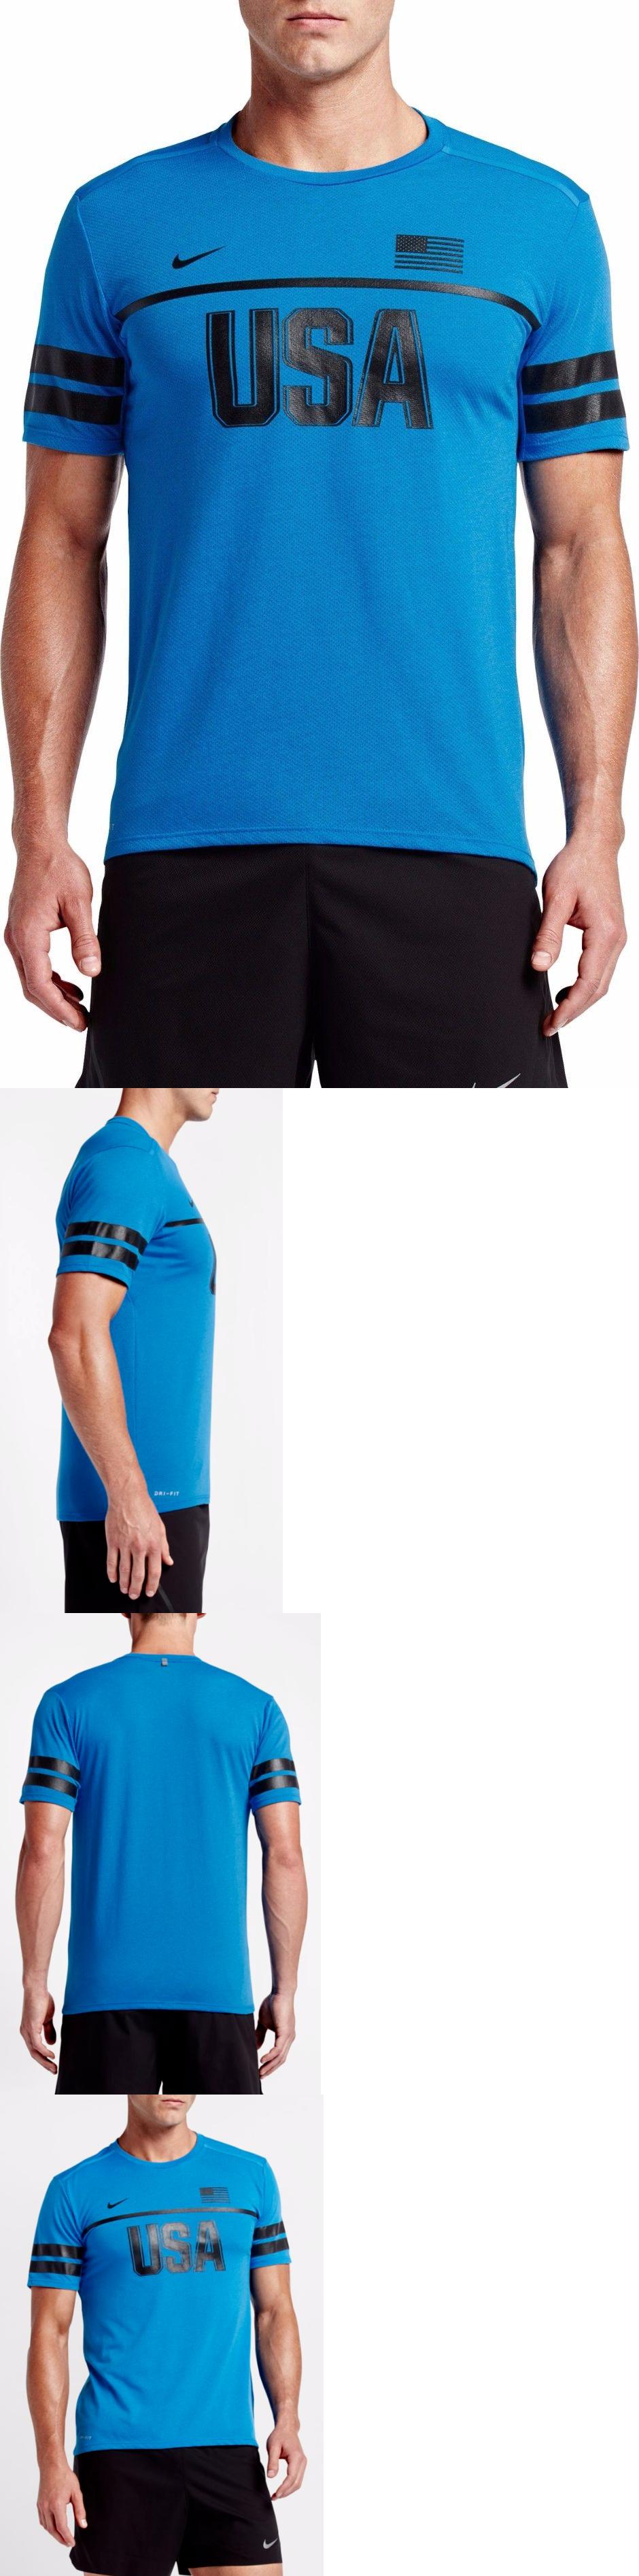 08129cd4b8c3 Shirts and Tops 70900  Nike Men S Energy Usa Running T-Shirt Size L ...